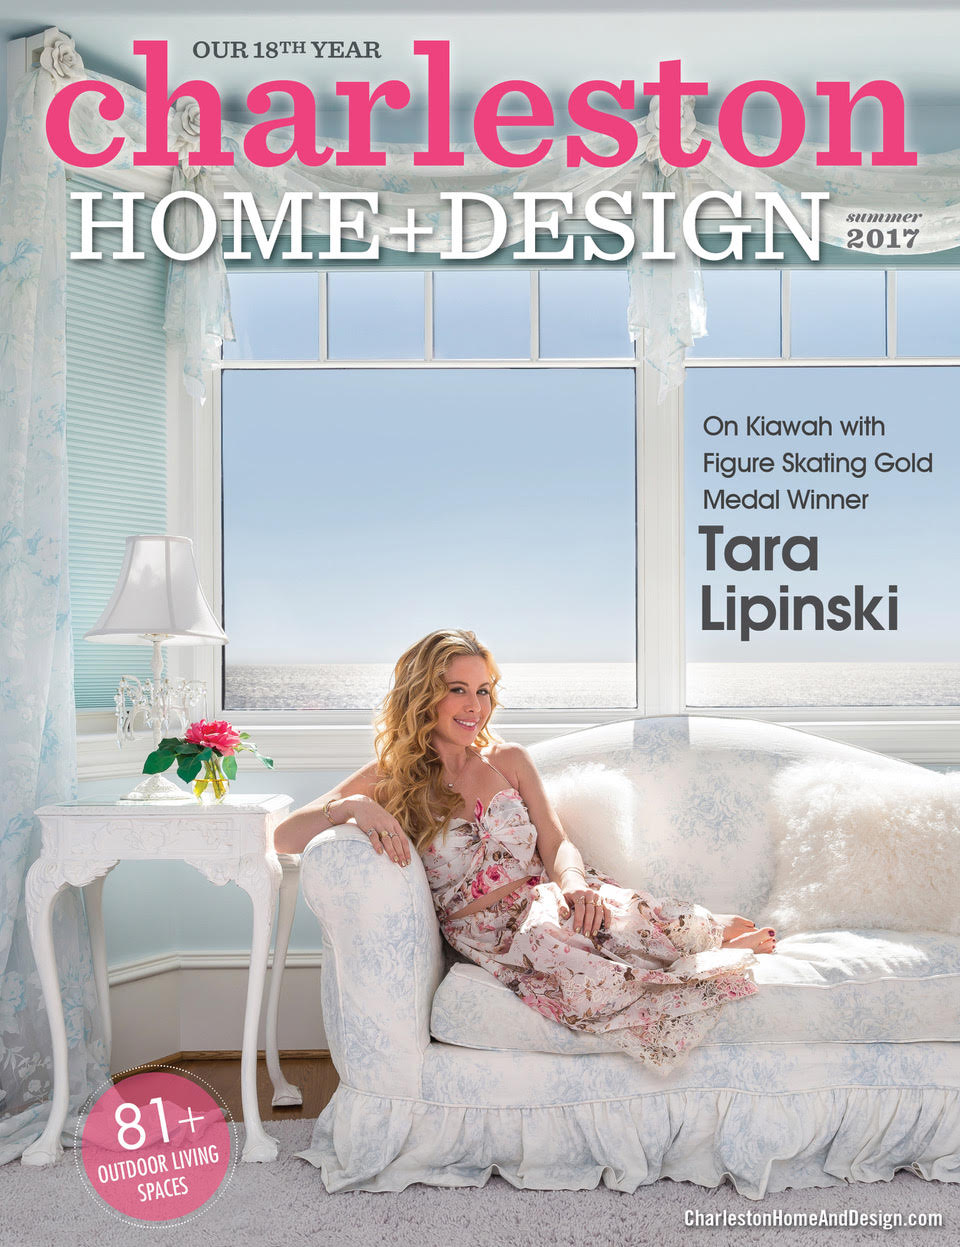 Charleston Home + Design Summer 2017 Magazine Cover